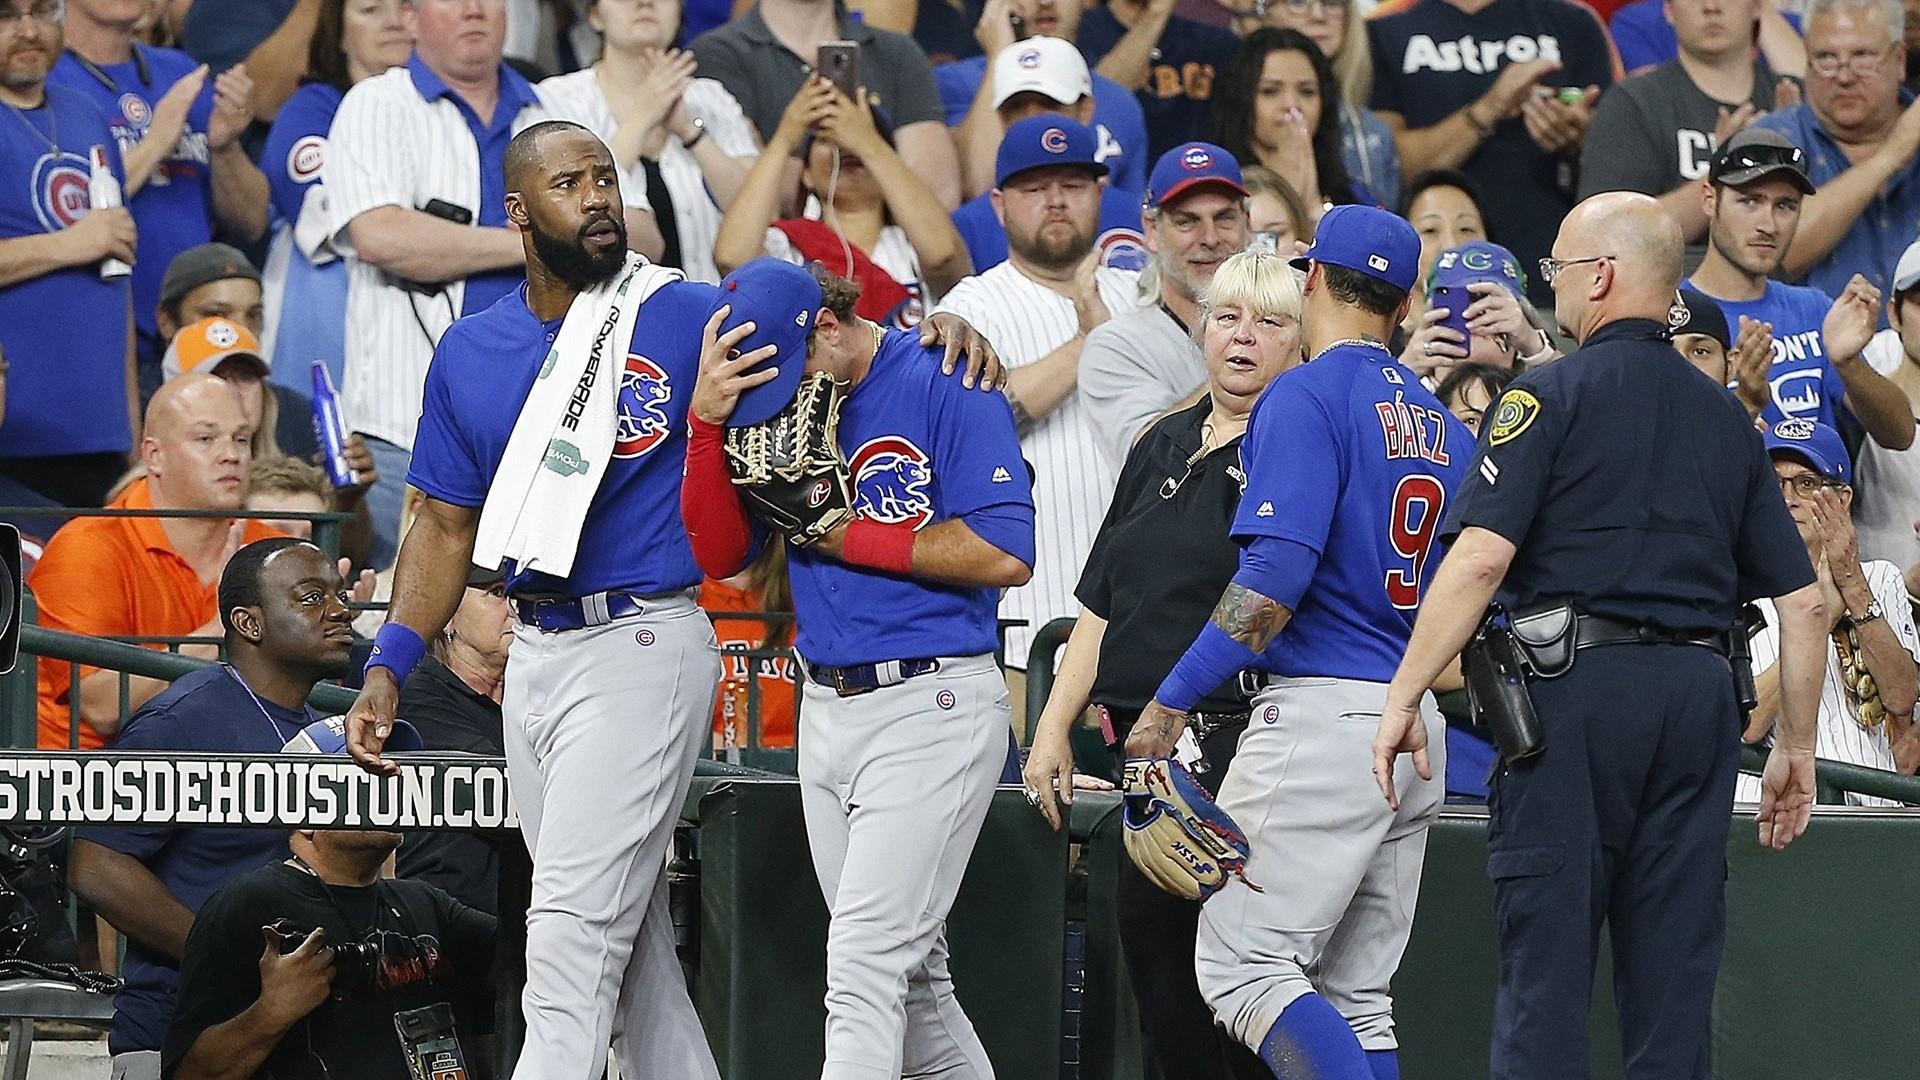 Child's foul ball injury renews calls for ballpark safety